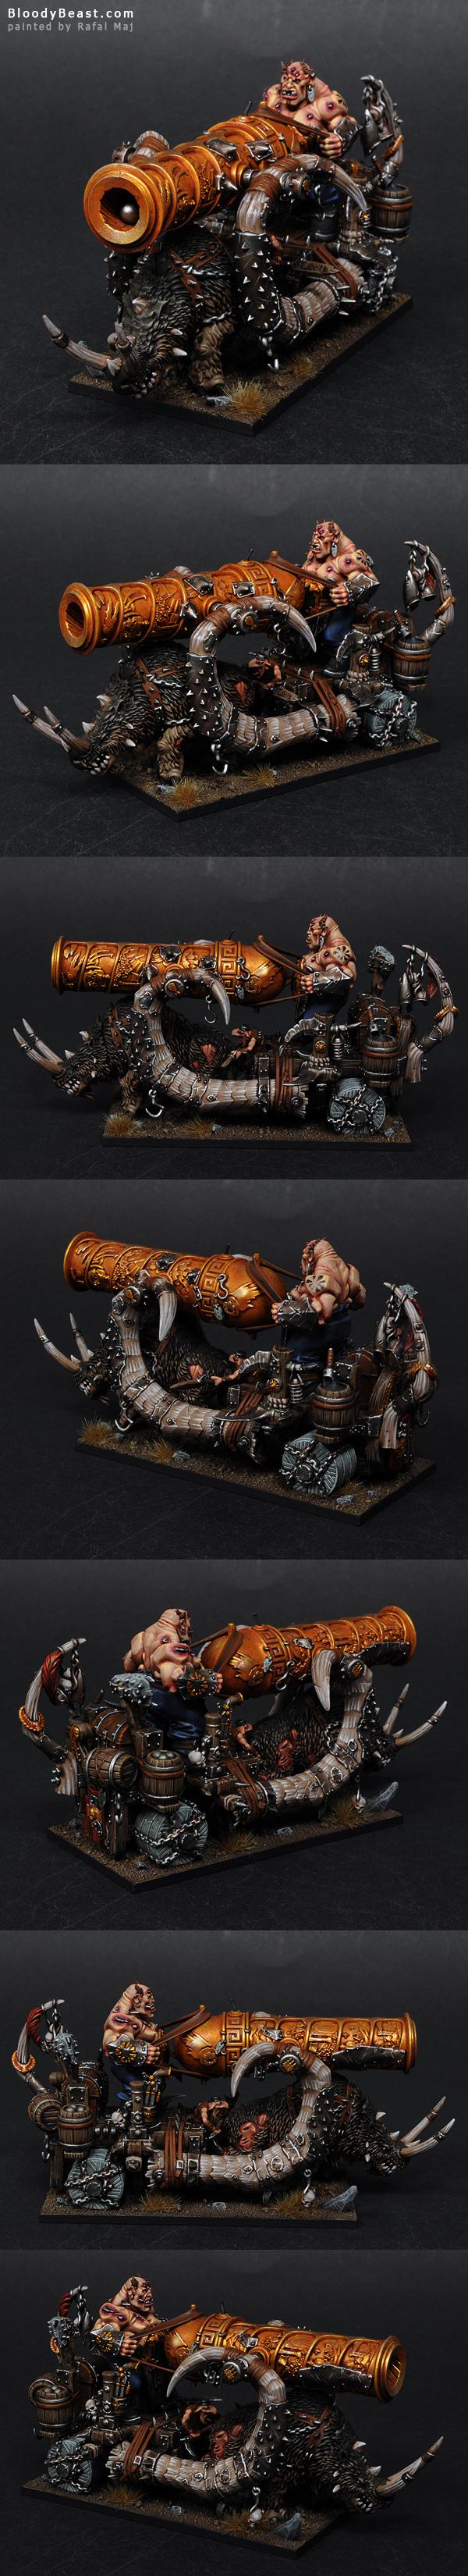 Ogre Kingdoms Ironblaster painted by Rafal Maj (BloodyBeast.com)